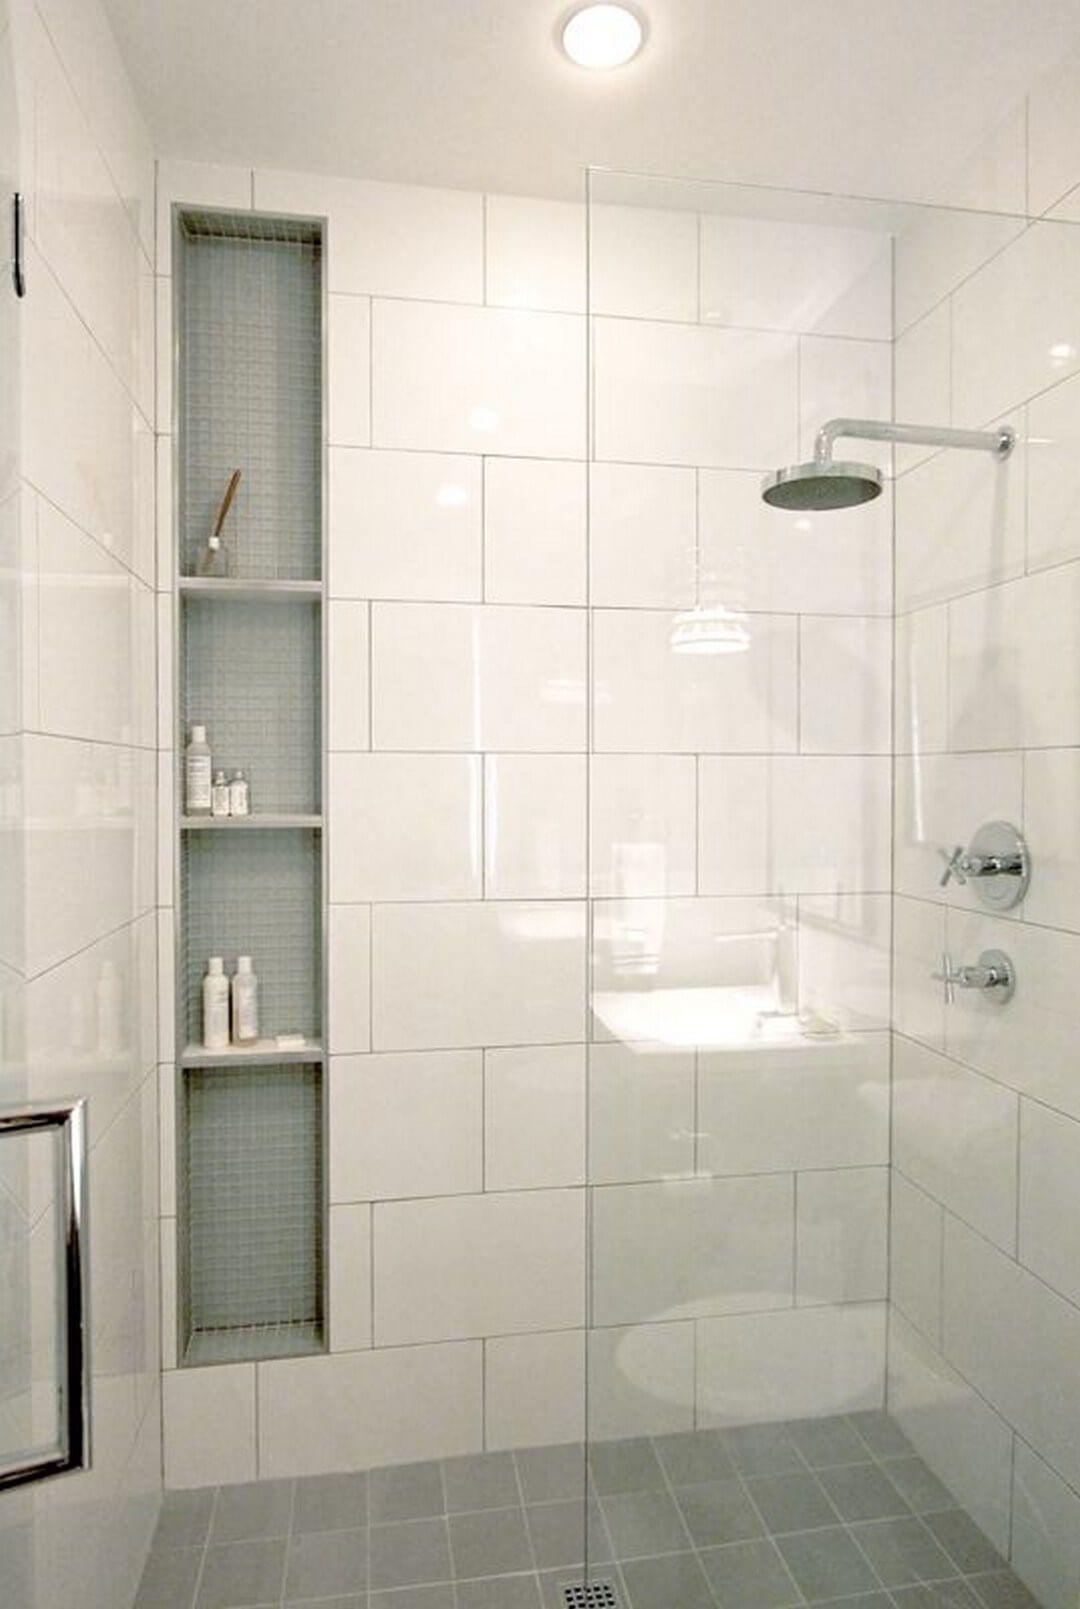 32 Best Shower Tile Ideas That Will Transform Your Bathroom Small Bathroom Remodel Small Bathroom Remodel Designs Bathroom Remodel Designs